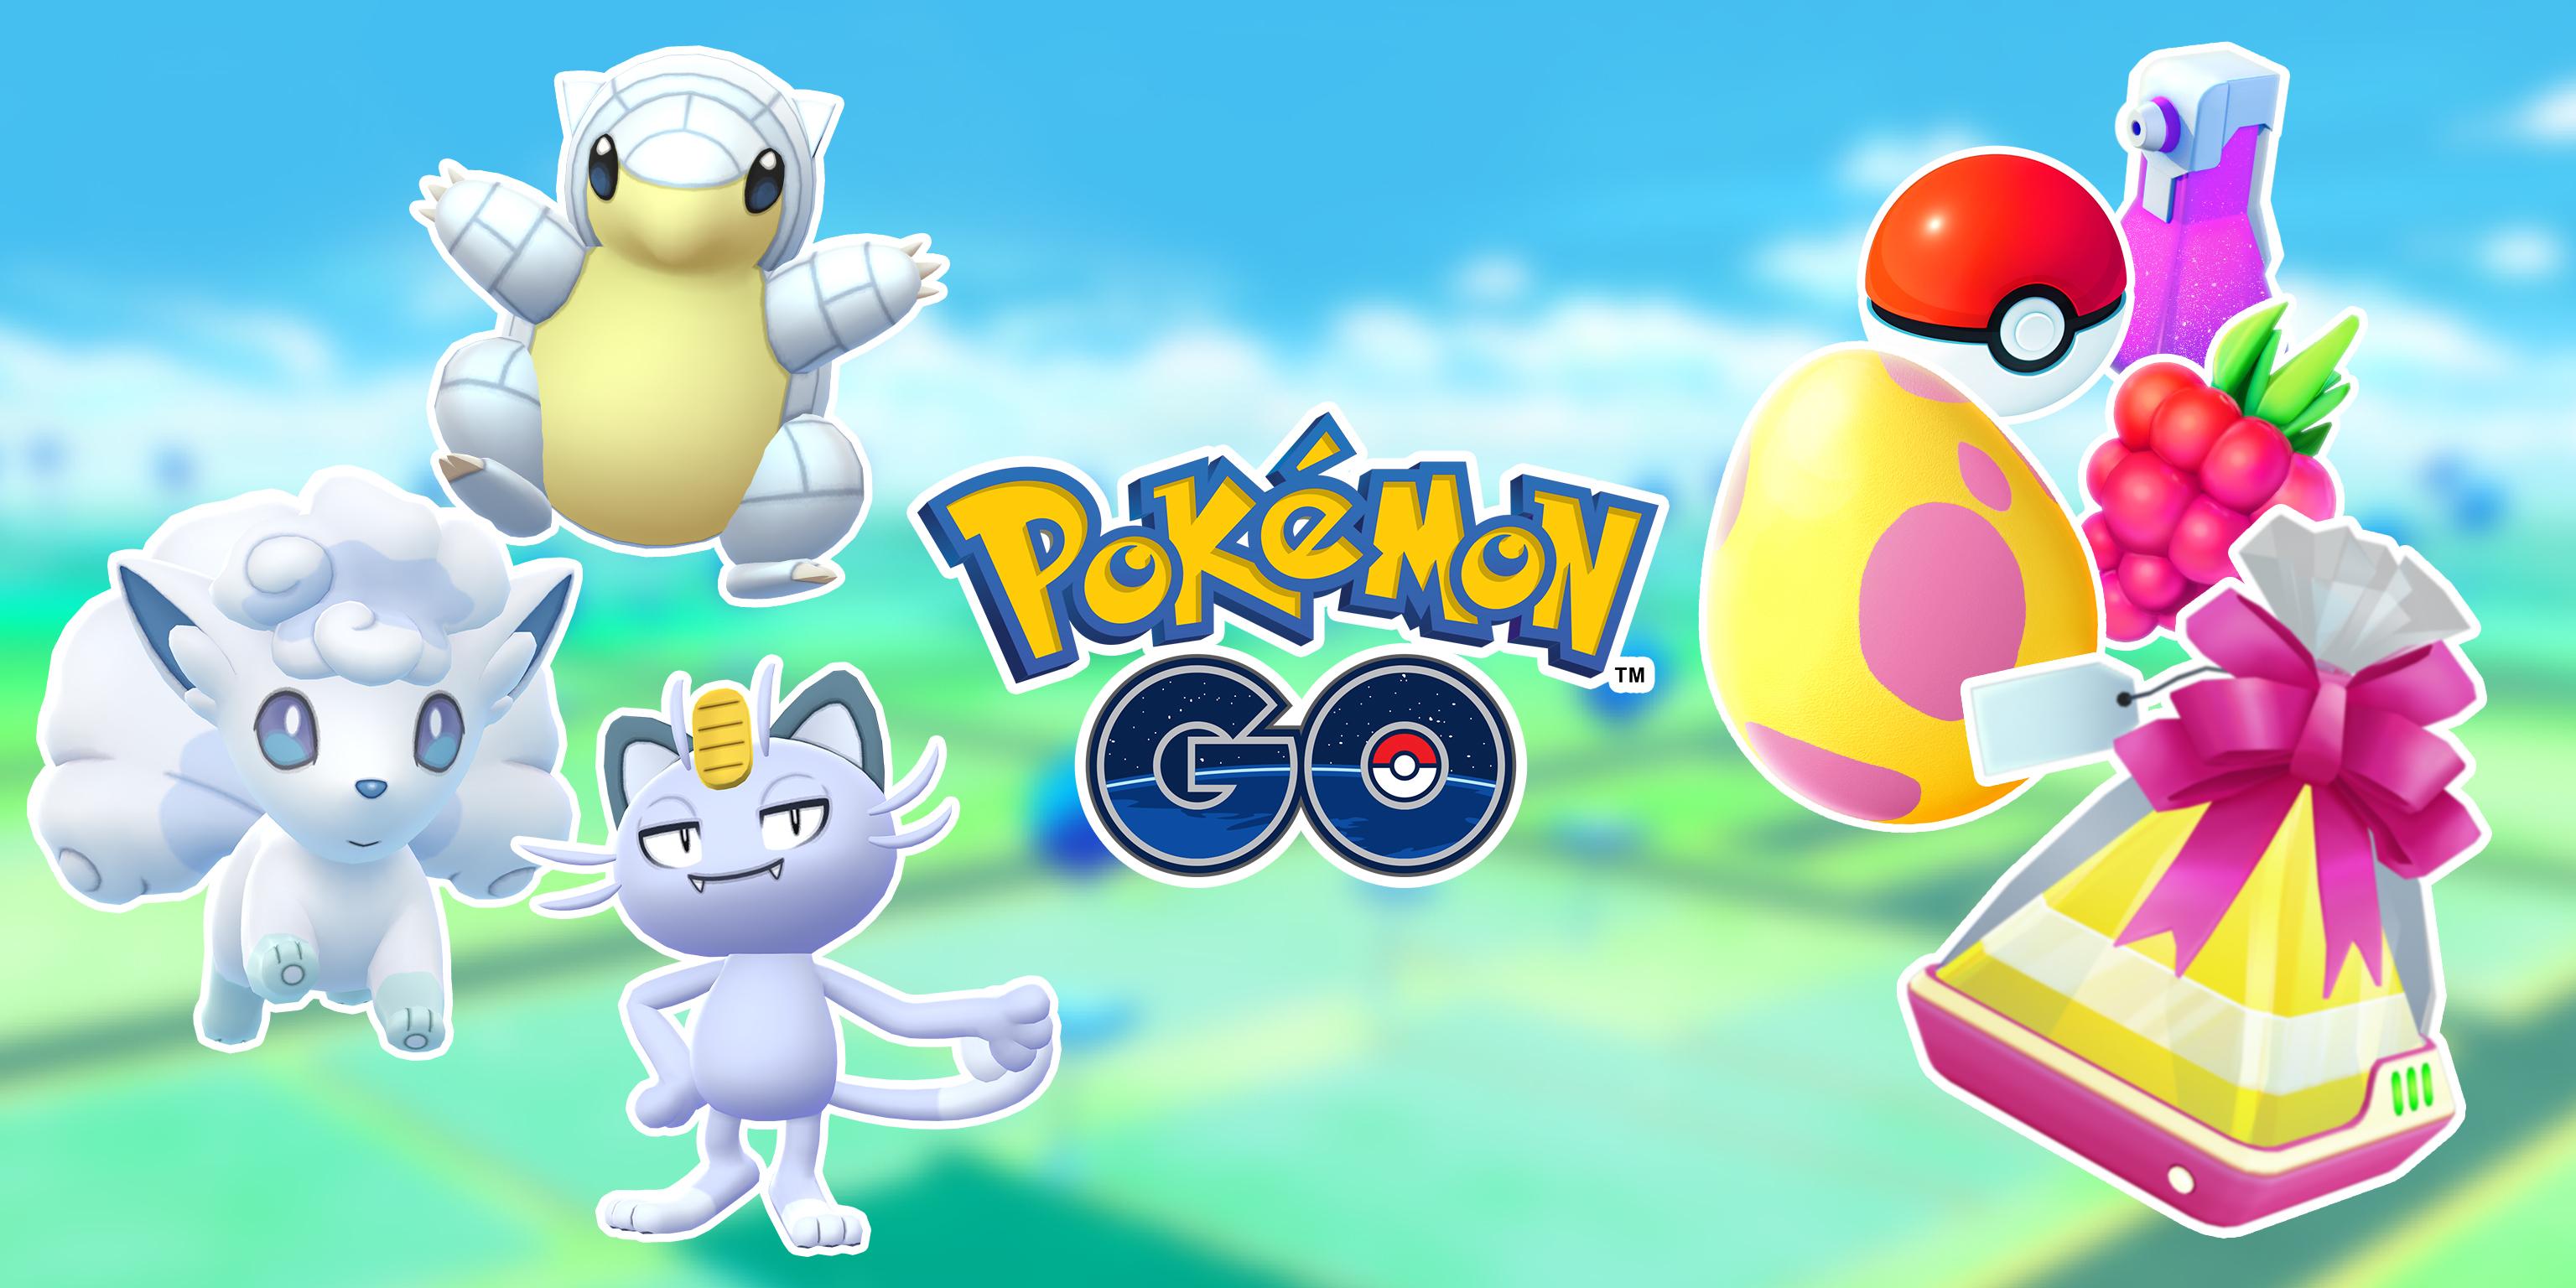 pokémon go』に「フレンド機能」が追加され、「ギフティング」や